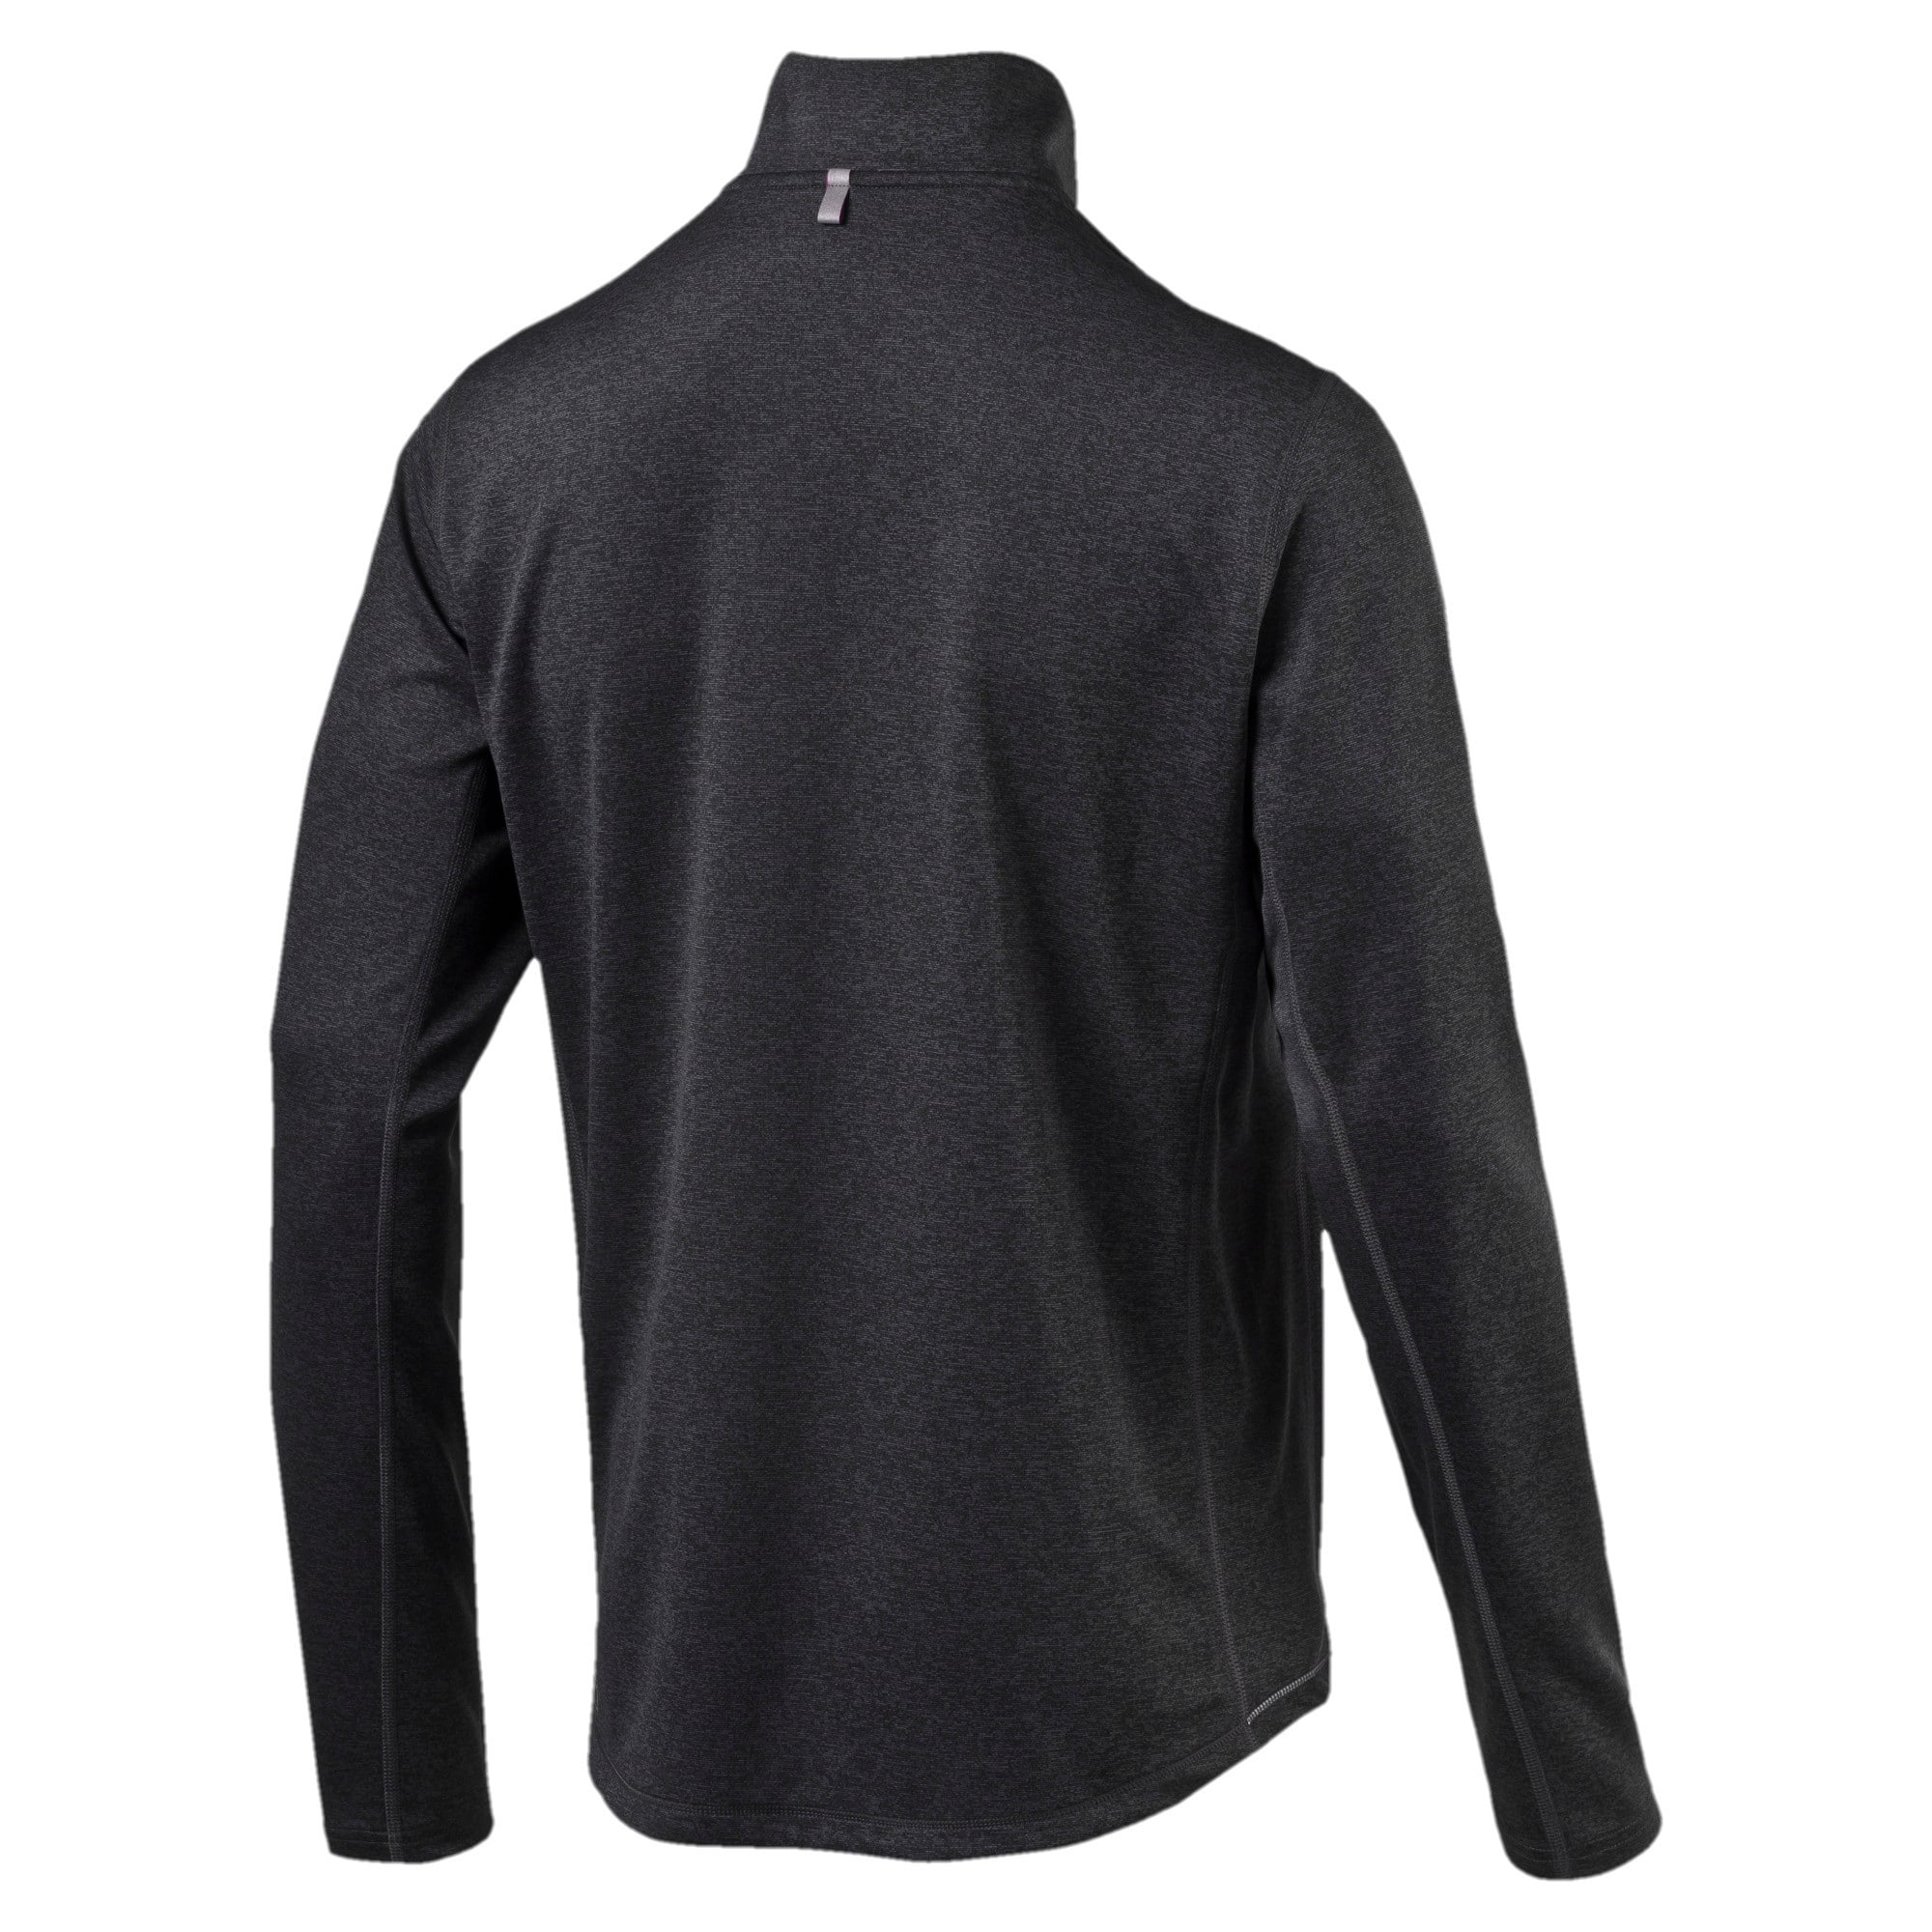 Thumbnail 4 of Running Men's Half Zip Long Sleeve, Black Heather-dtm stitching, medium-IND